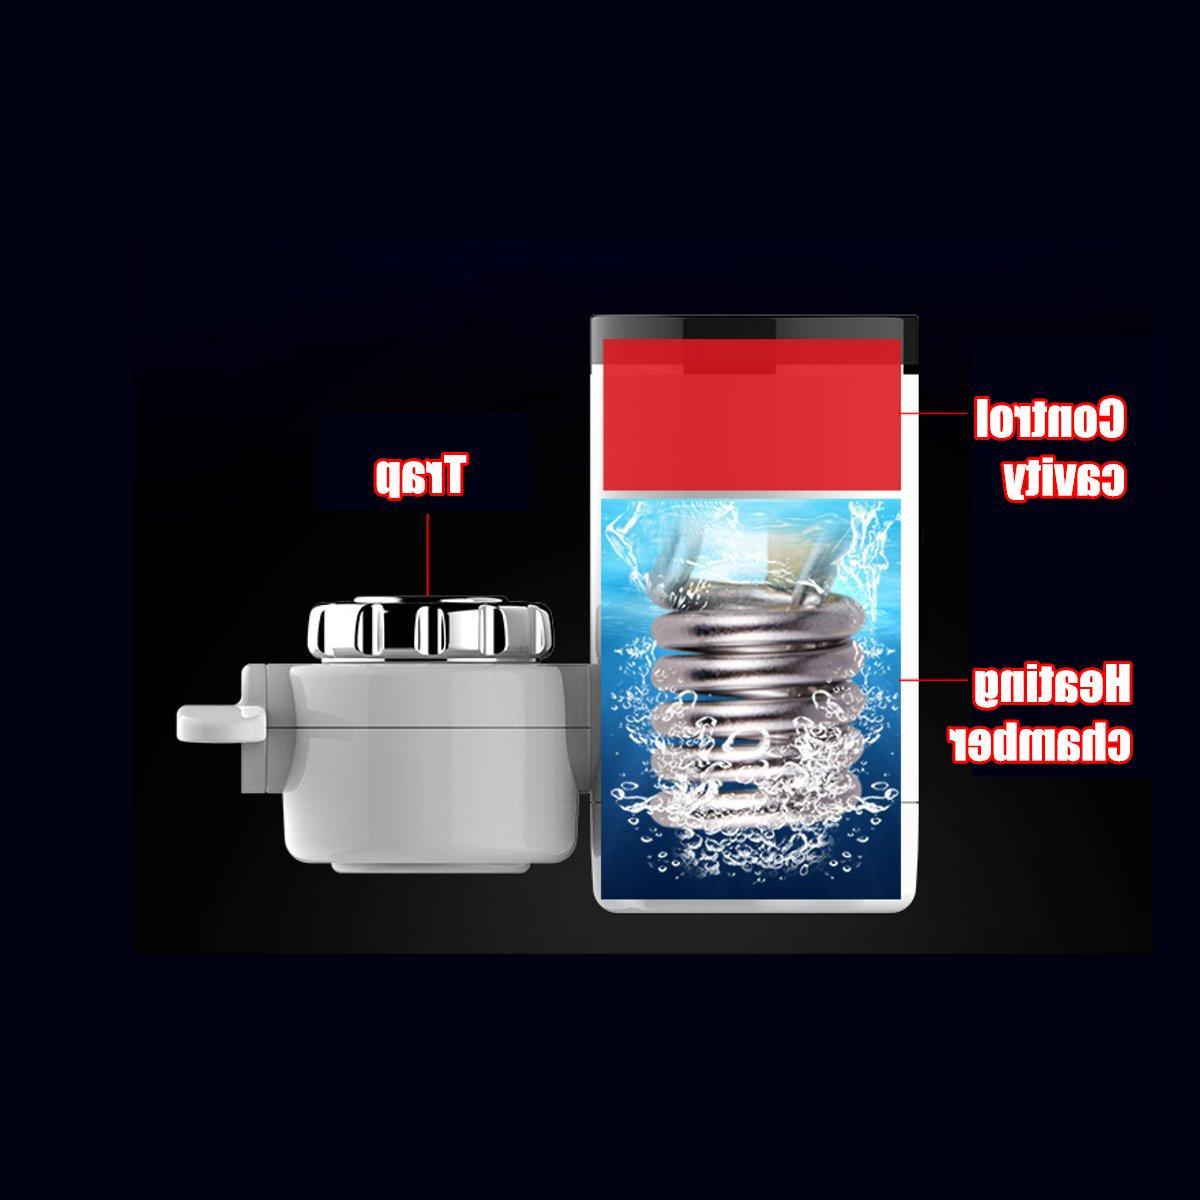 Kitchen Faucet <font><b>Water</b></font> Display Electric <font><b>Water</b></font> <font><b>Heater</b></font> Tankless Heating